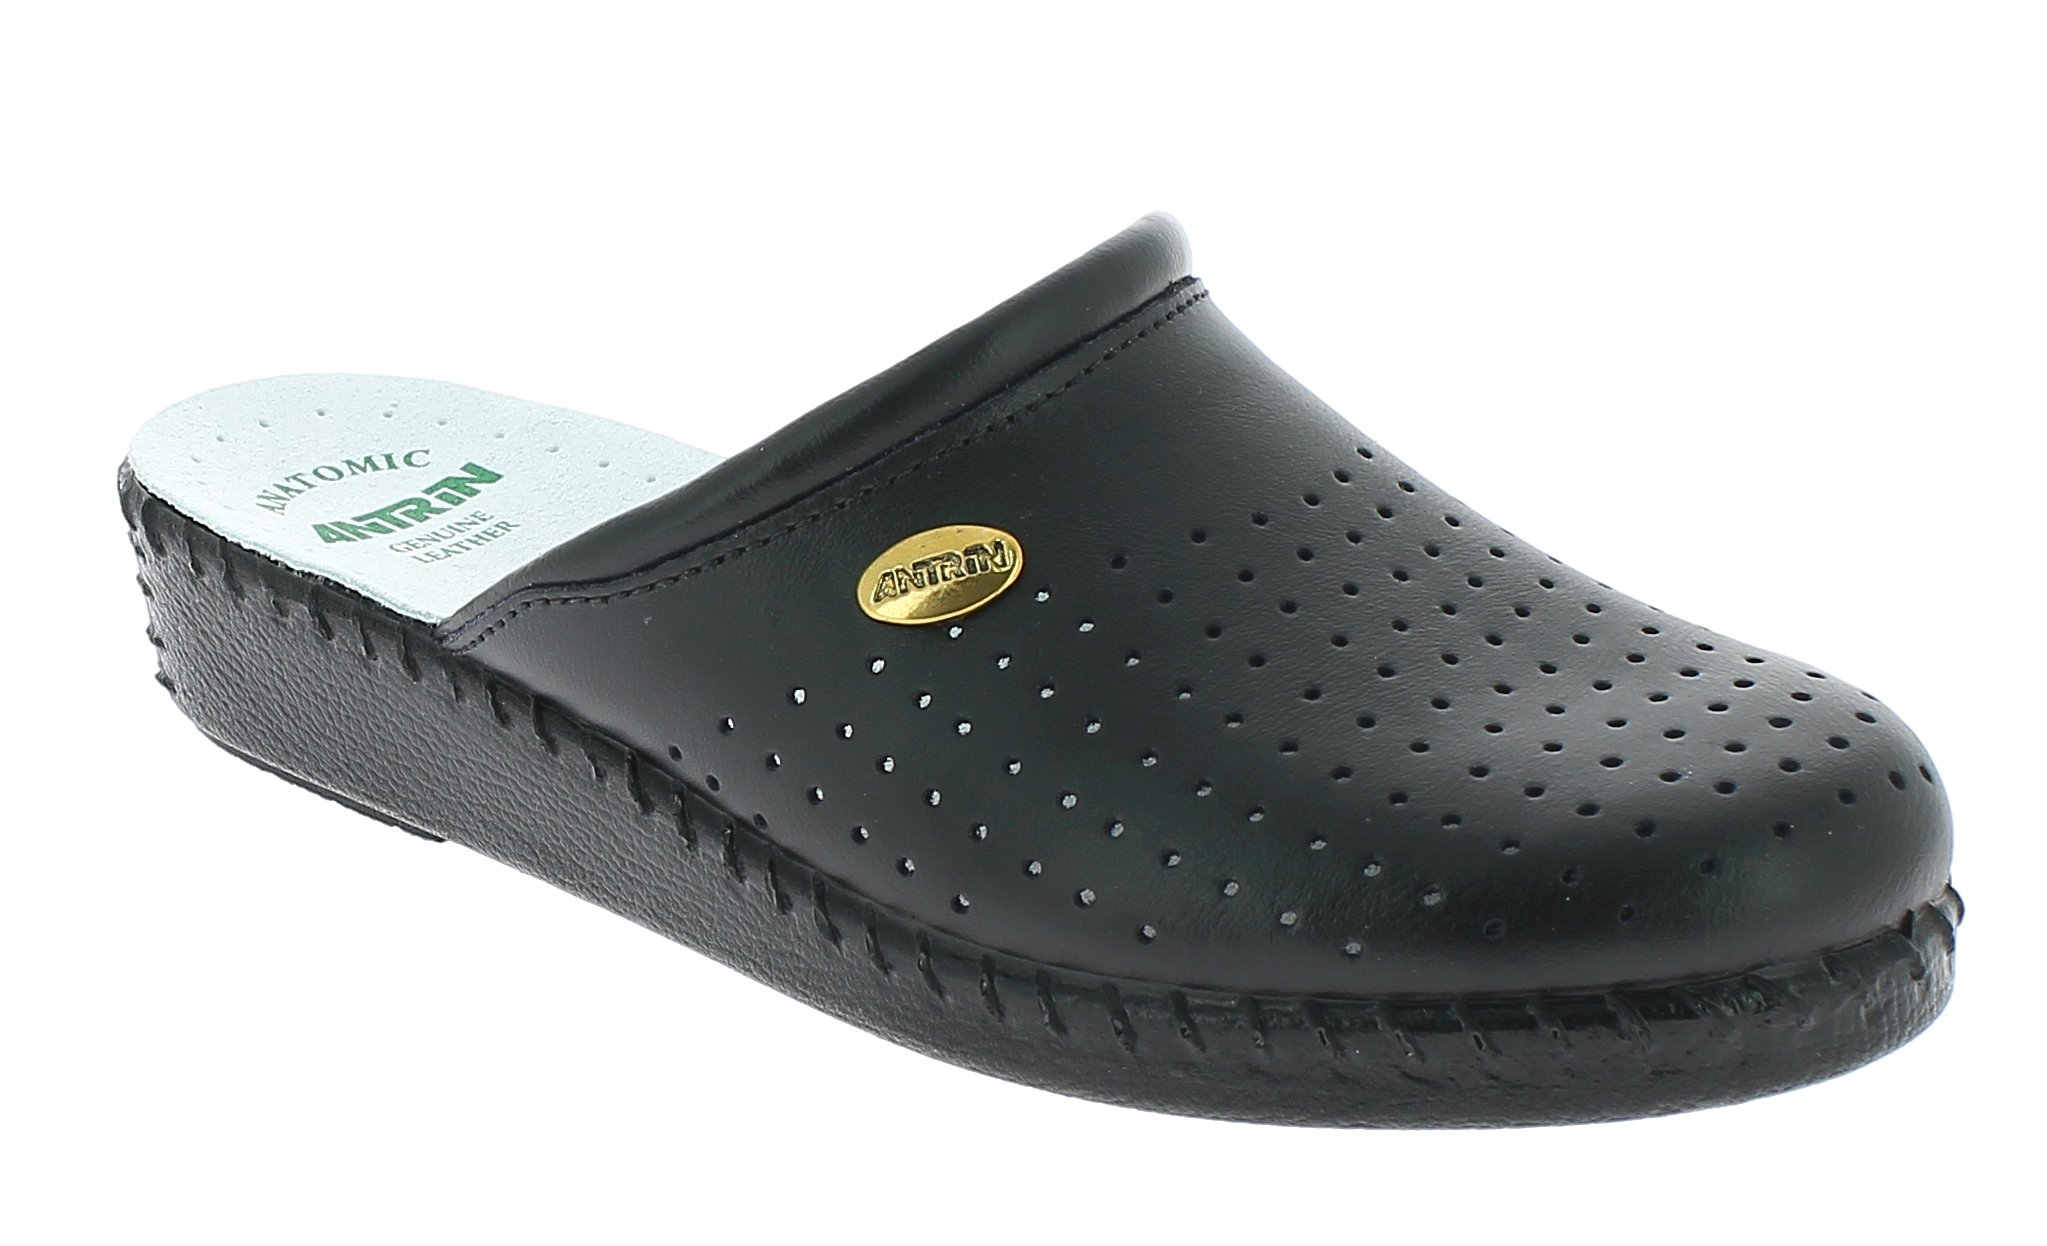 ANTRIN Γυναικείο Comfort 230 Μαύρο - IqShoes - 230 BLACK-black-35/1/15/29 προϊόντα παπούτσια